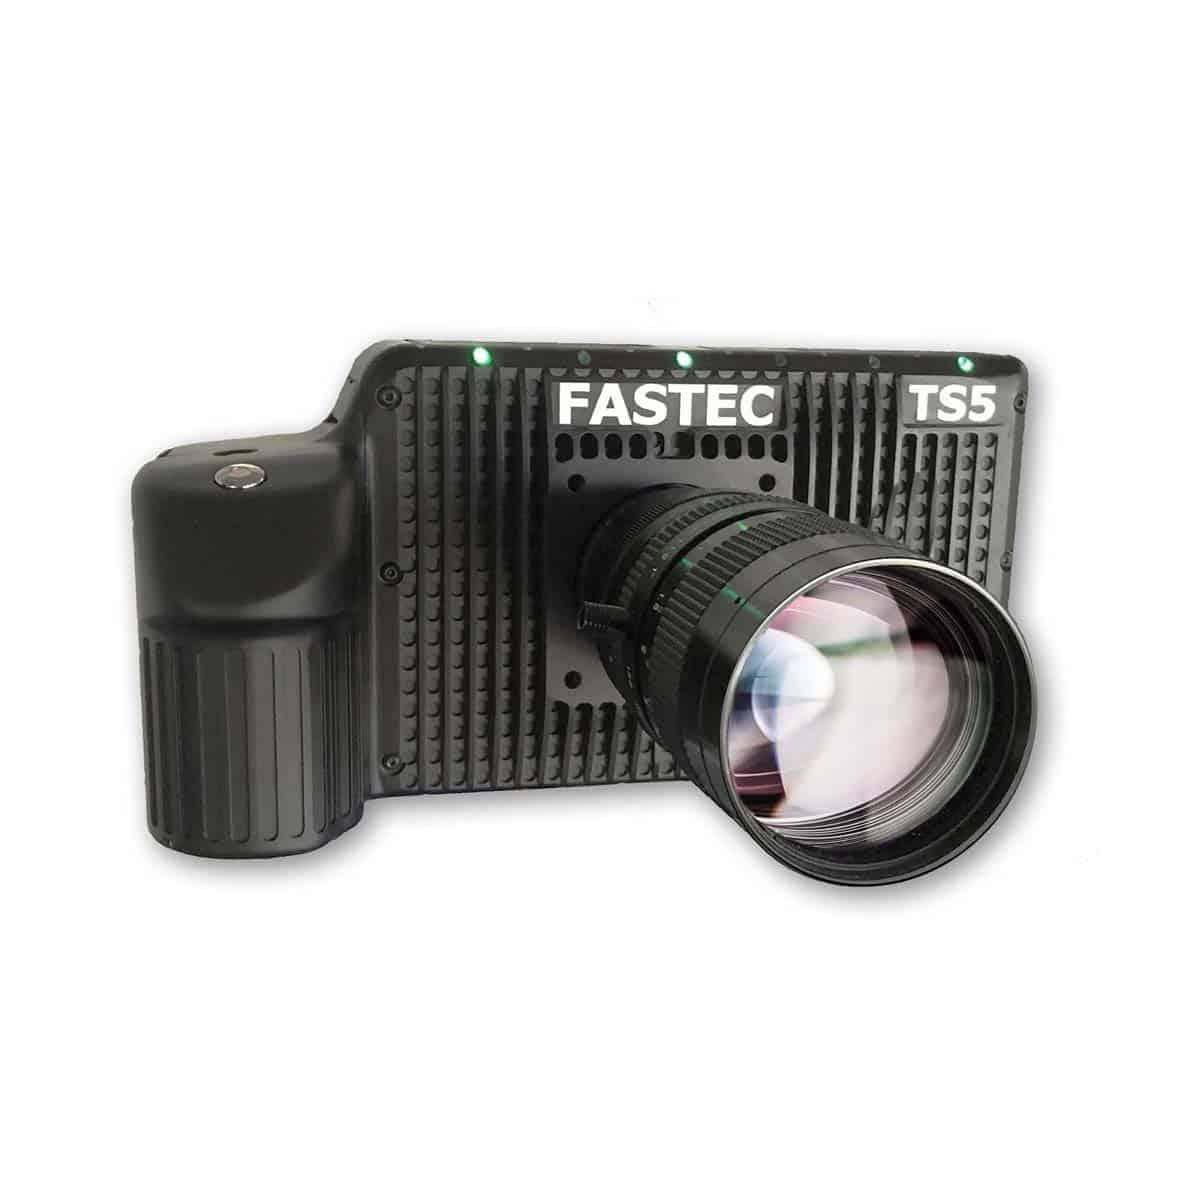 high speed camera fastec imaging TS5